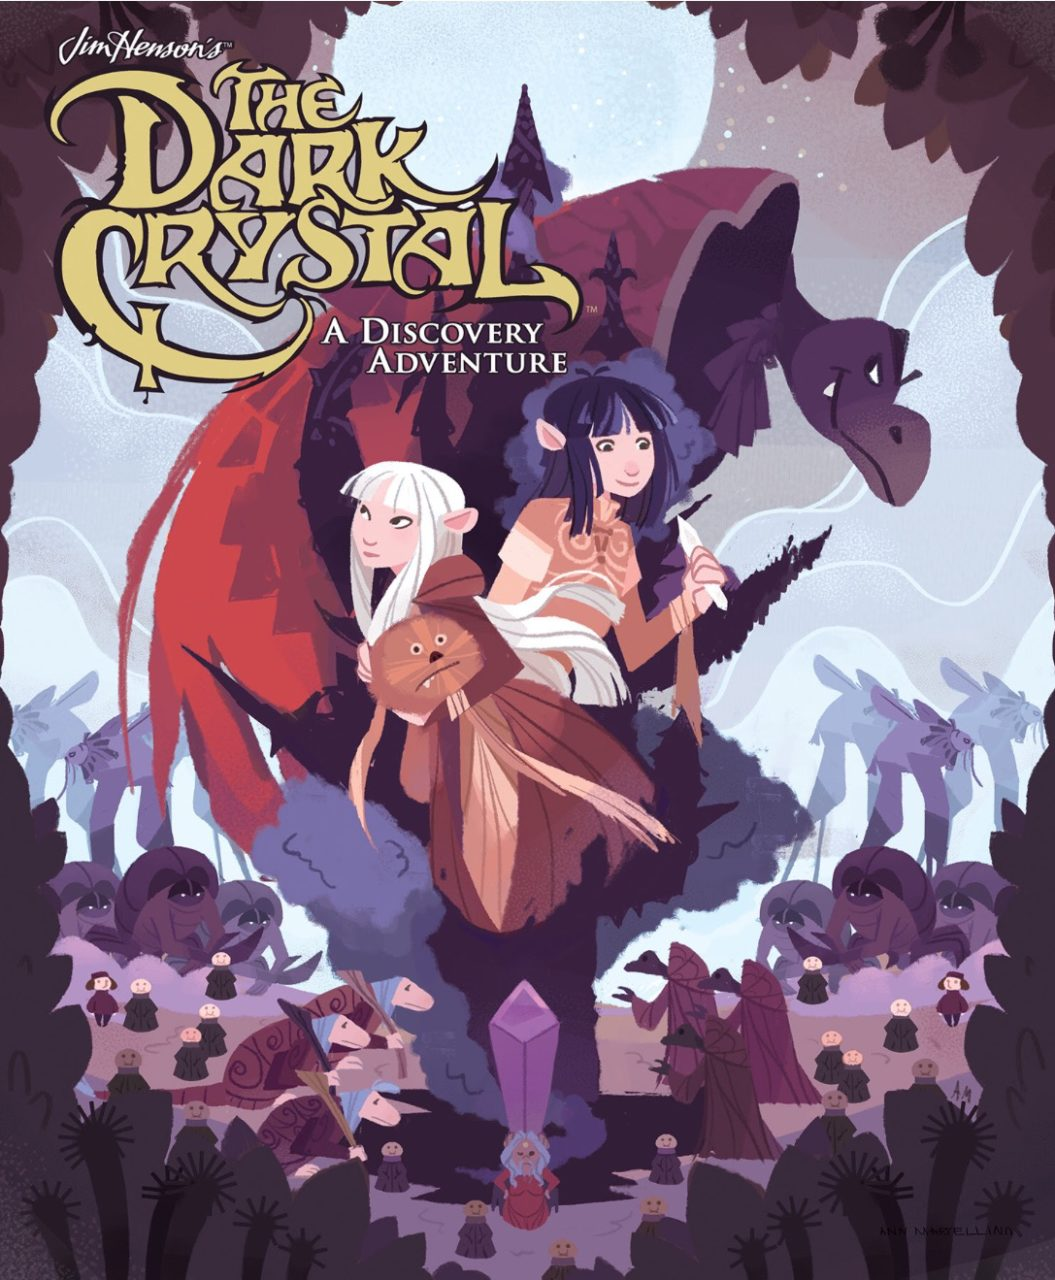 Ann Narcellino's Dark Crystal Discovery Adventure, Archaia, BOOM! Studios, 2018